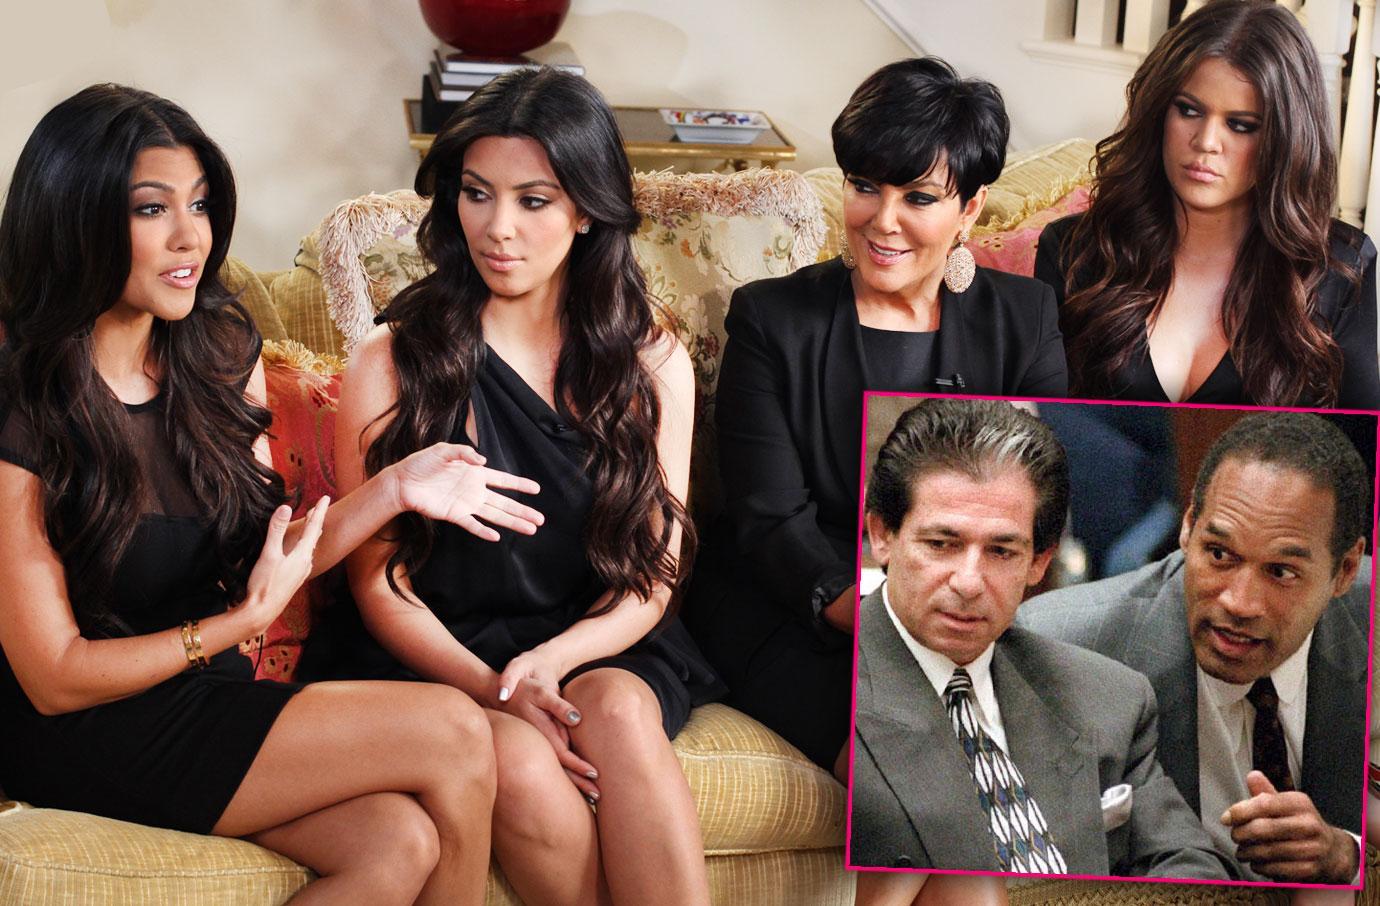 //nicole brown simpson oj simpson murder trial destroy robert kardashian family pics pp